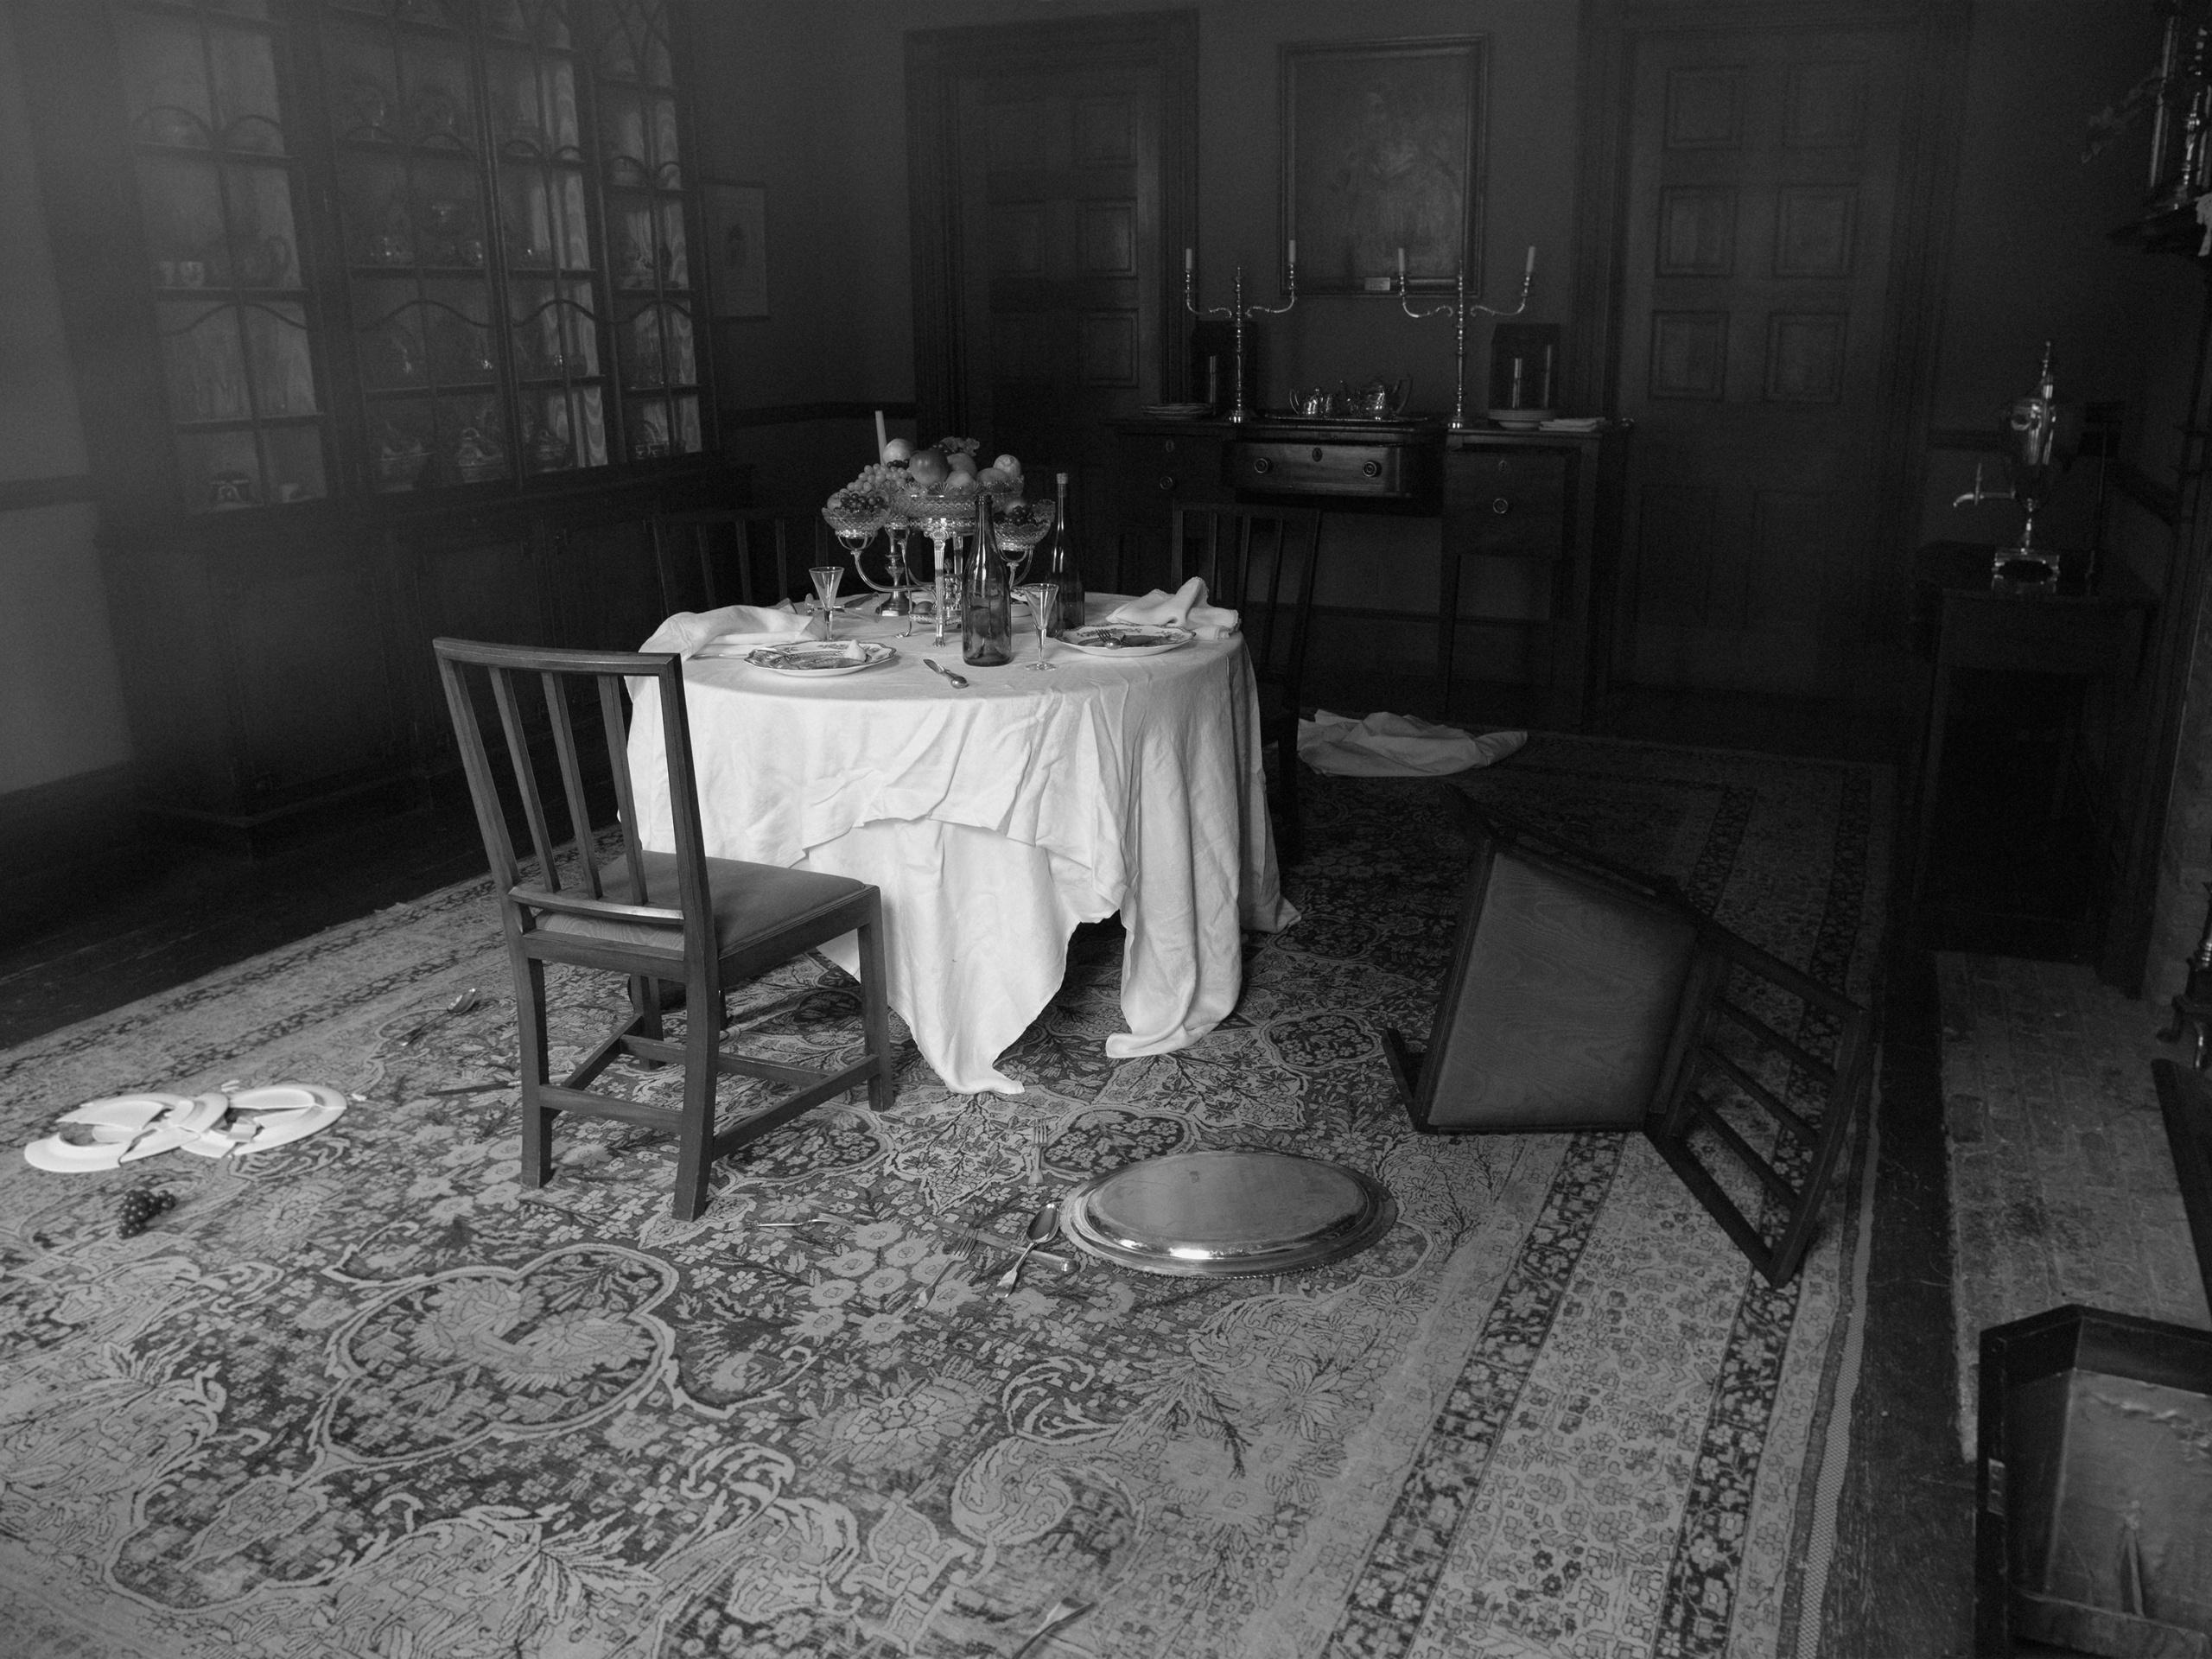 Tereza Zelenkova, Dining Room I, Campbell House, 2020. Courtesy the artist and The Ravestijn Gallery, Amsterdam